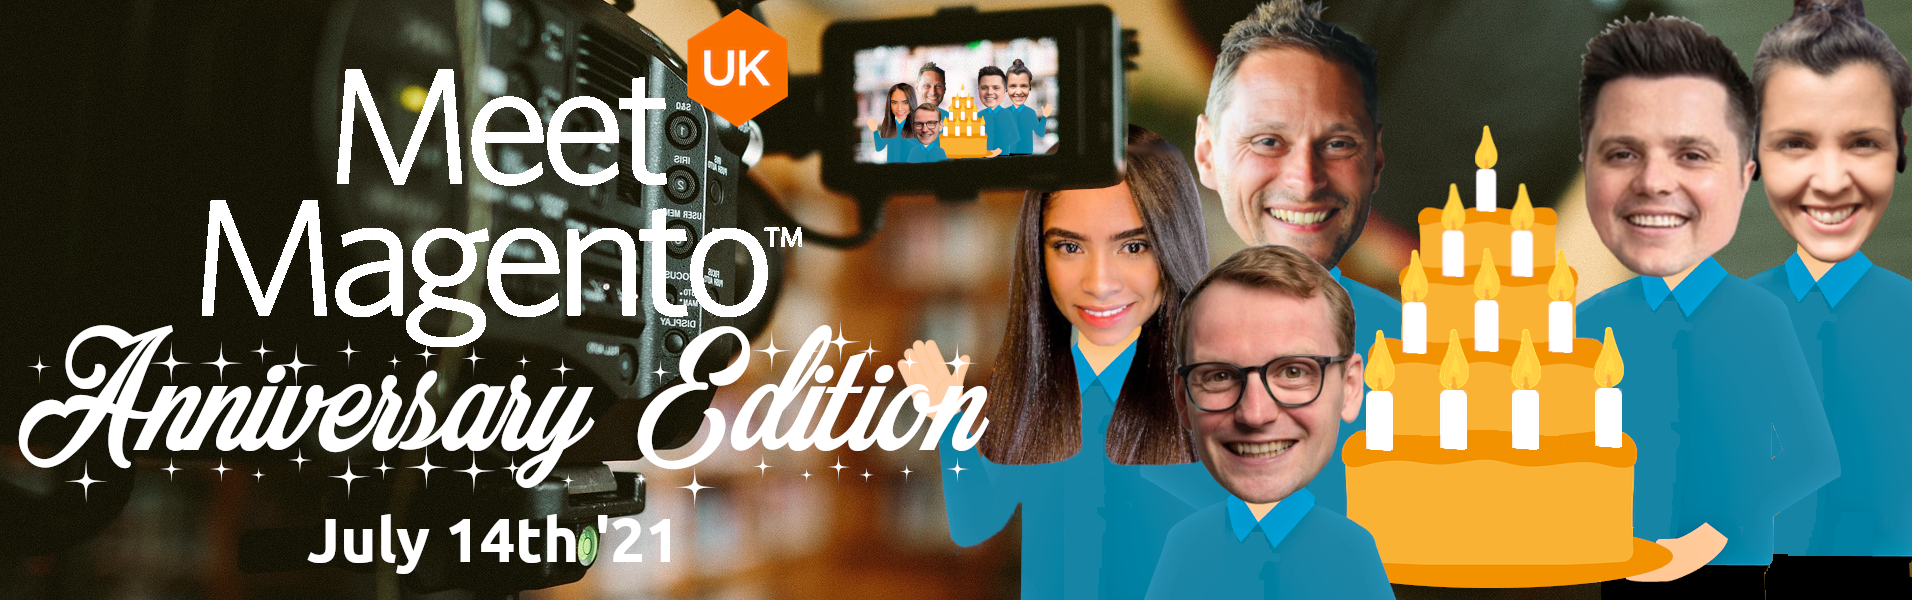 Meet Magento UK '21 - Tchaysllaney Rayenelly, Anton Evers, Domm Holland,  Michael Schirrmacher, Sandra Gonzalez Mangana.